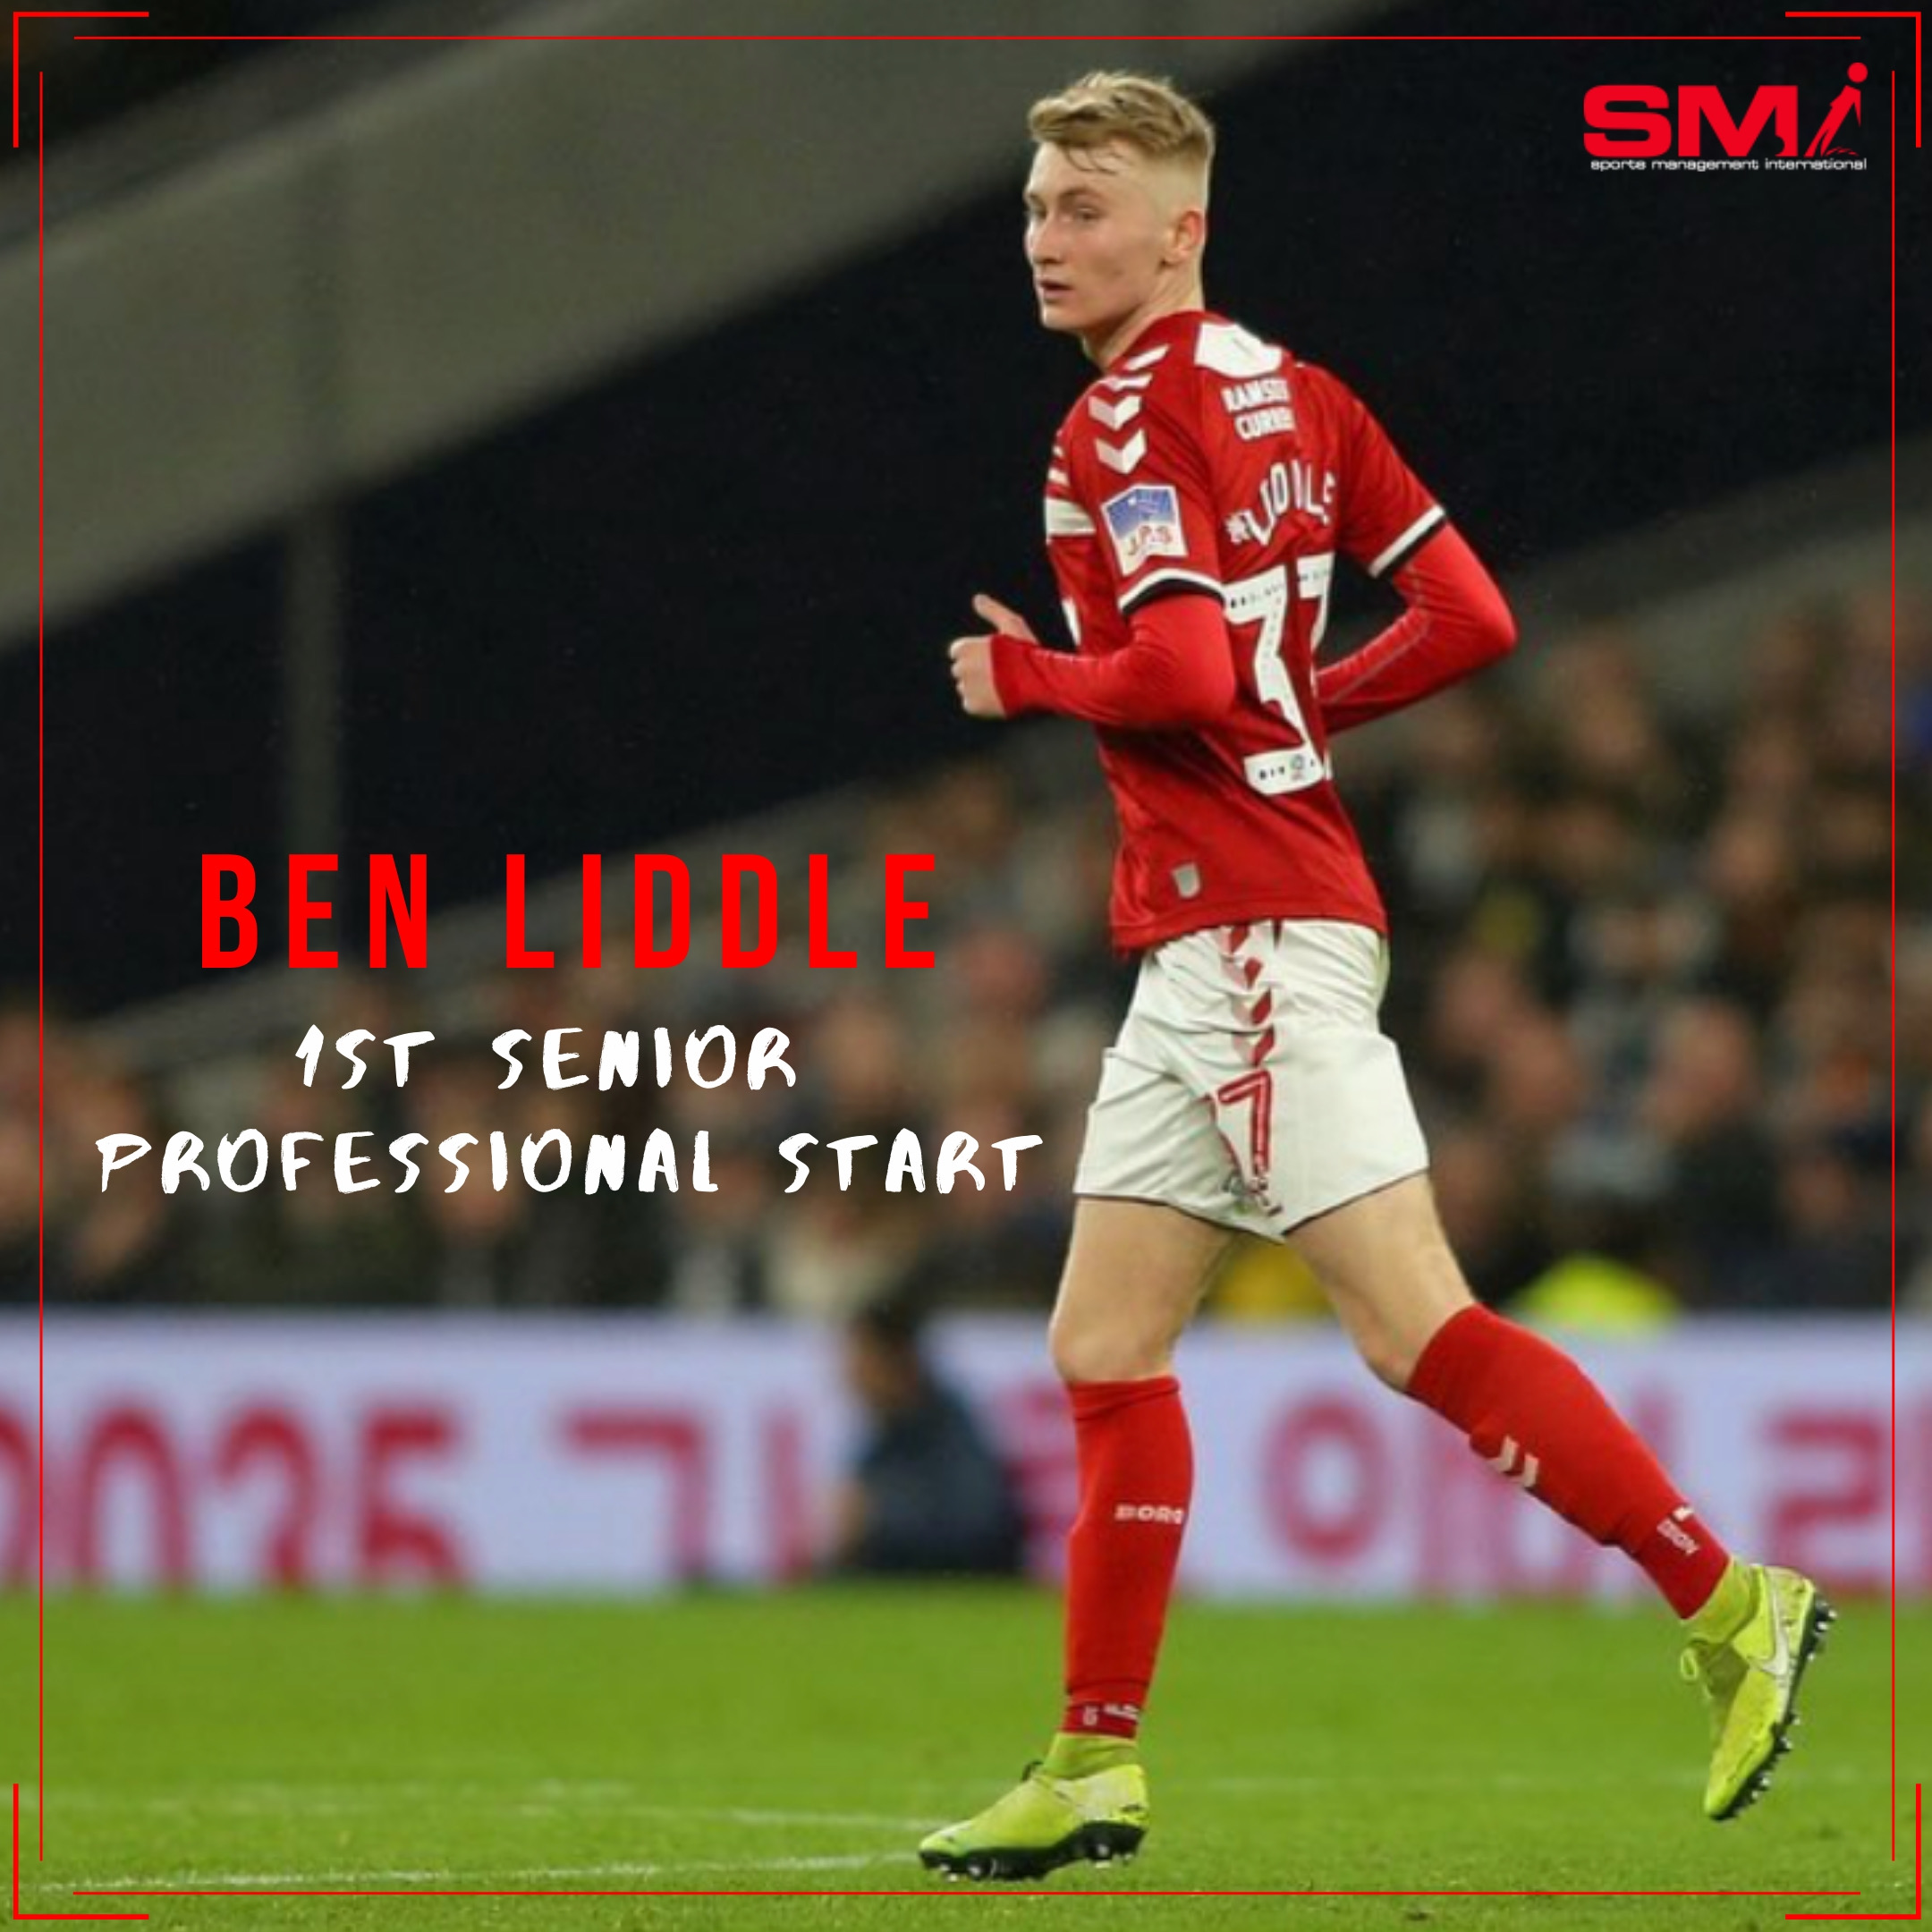 Ben Liddle 1st professional start